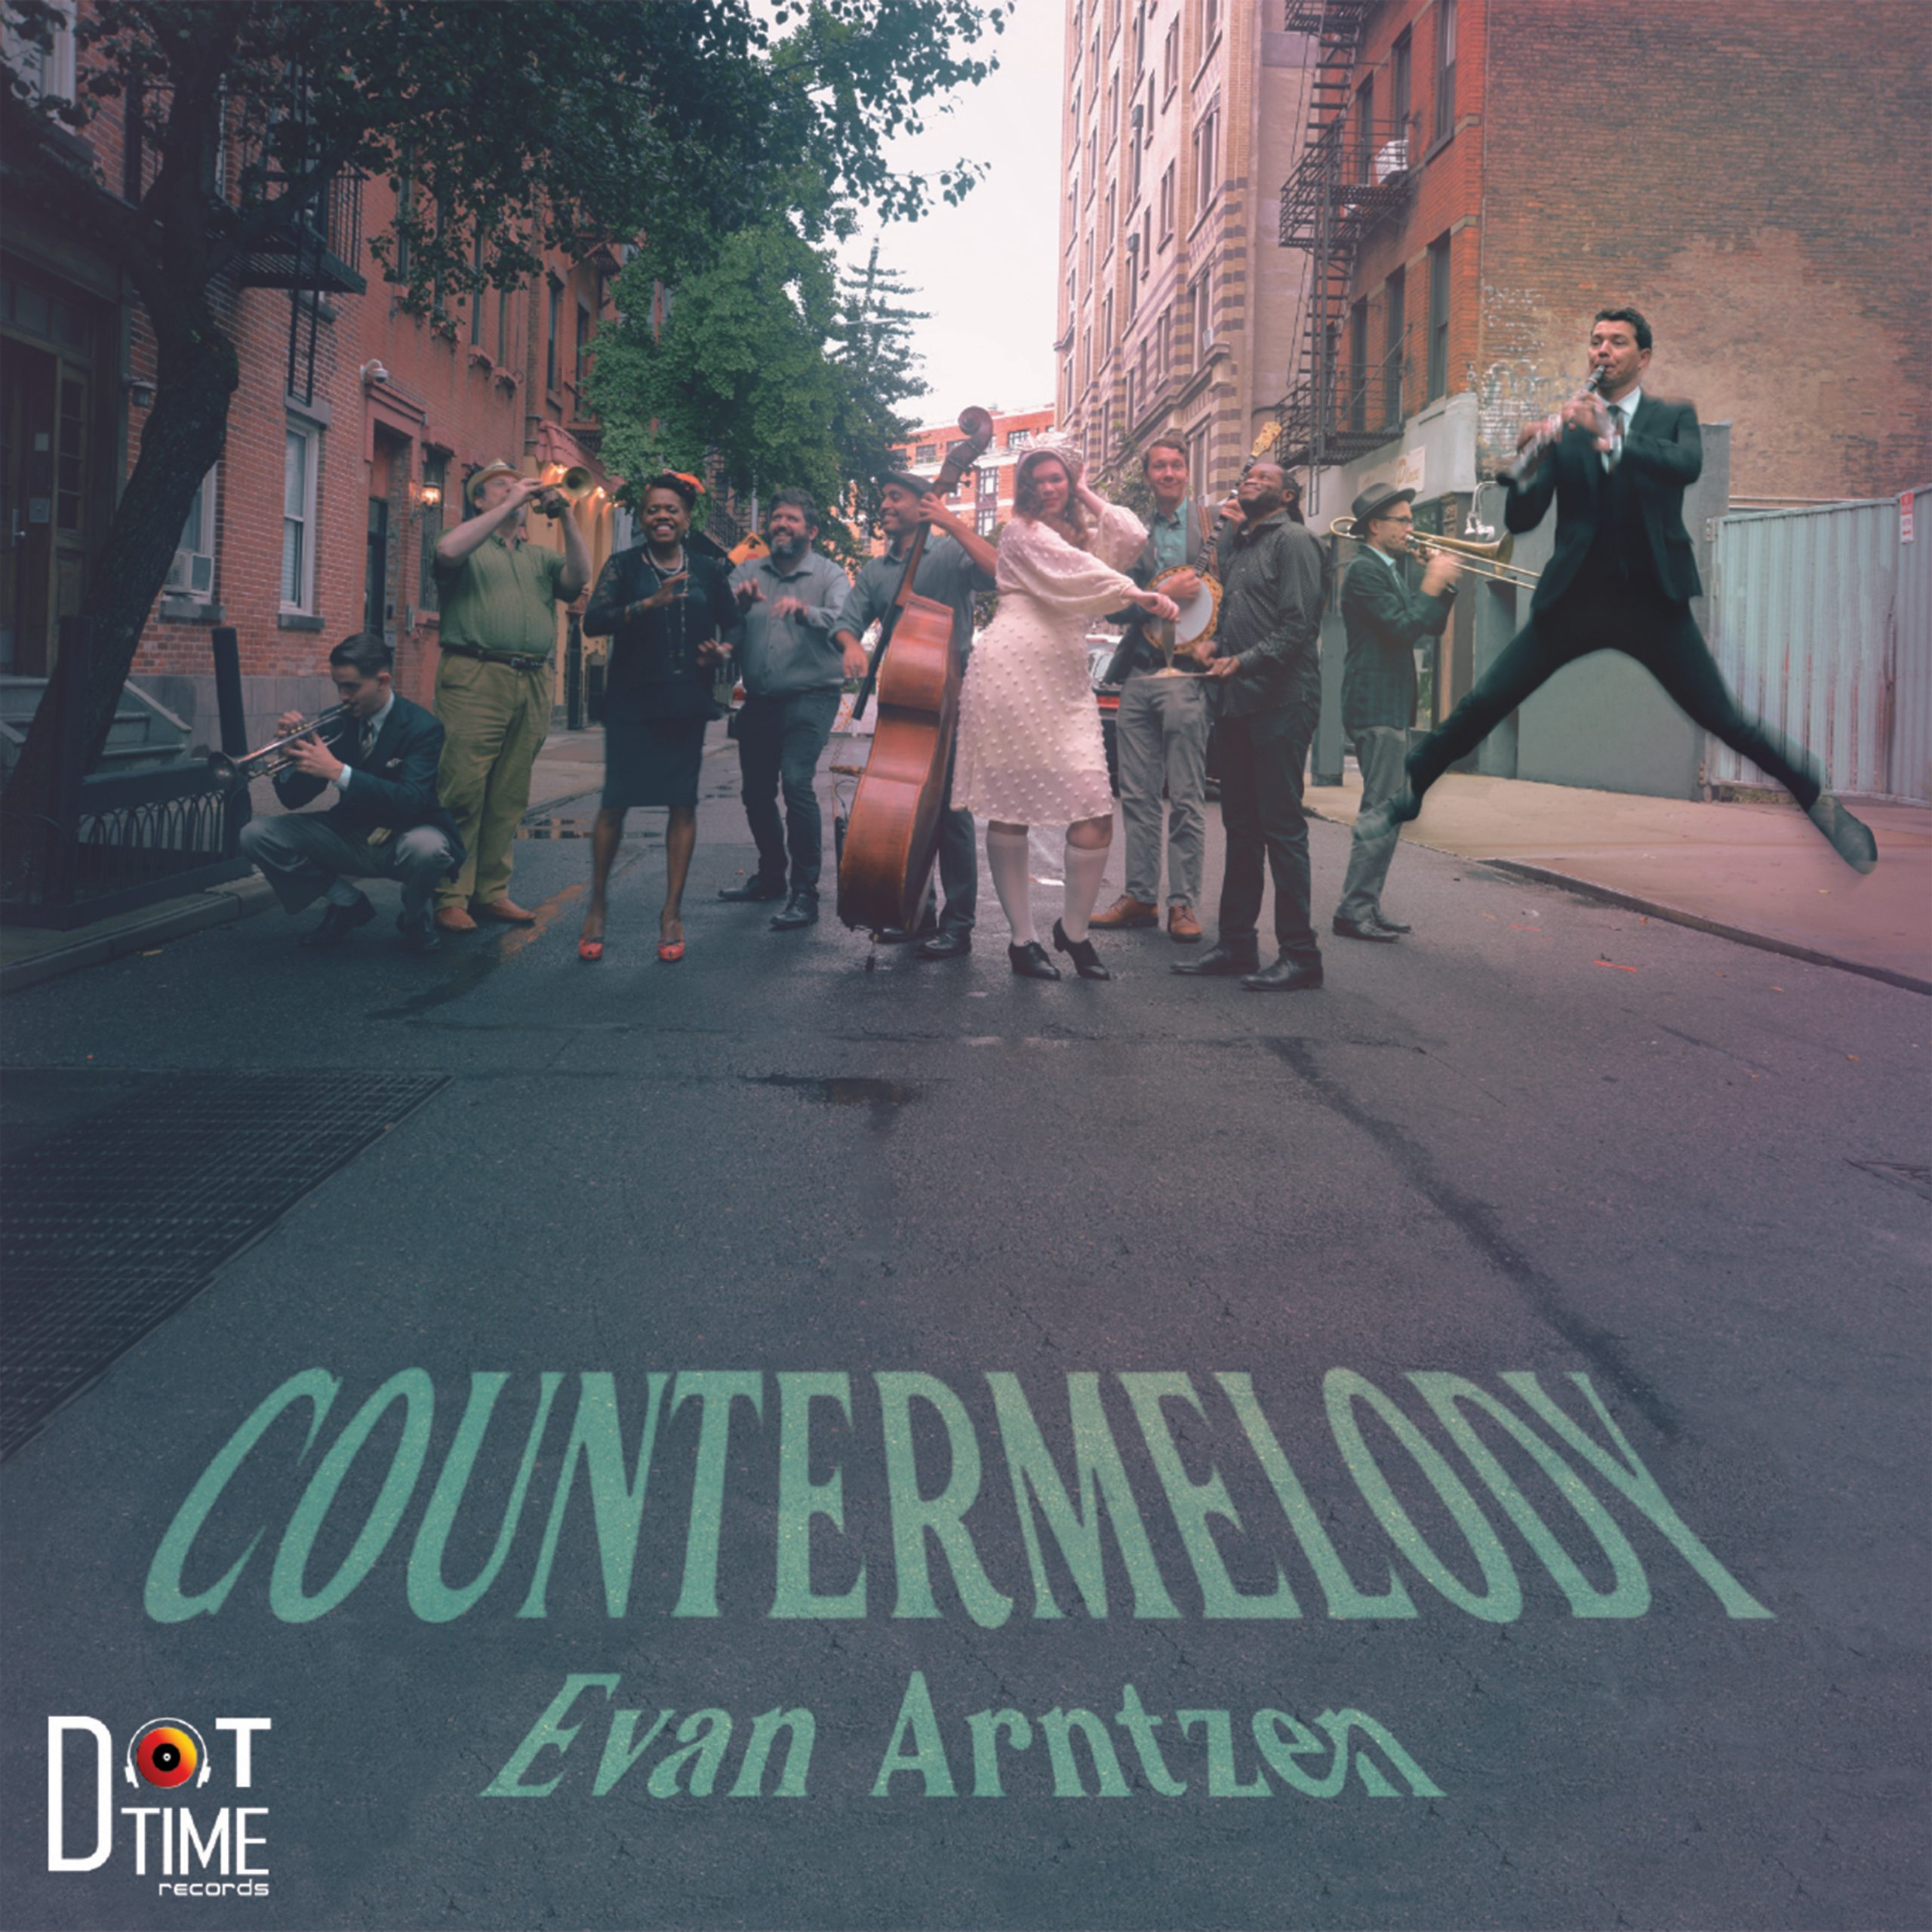 NEW RELEASE: Evan Arntzen's 'Countermelody' Due Out April 16, 2021 via Dot Time Records